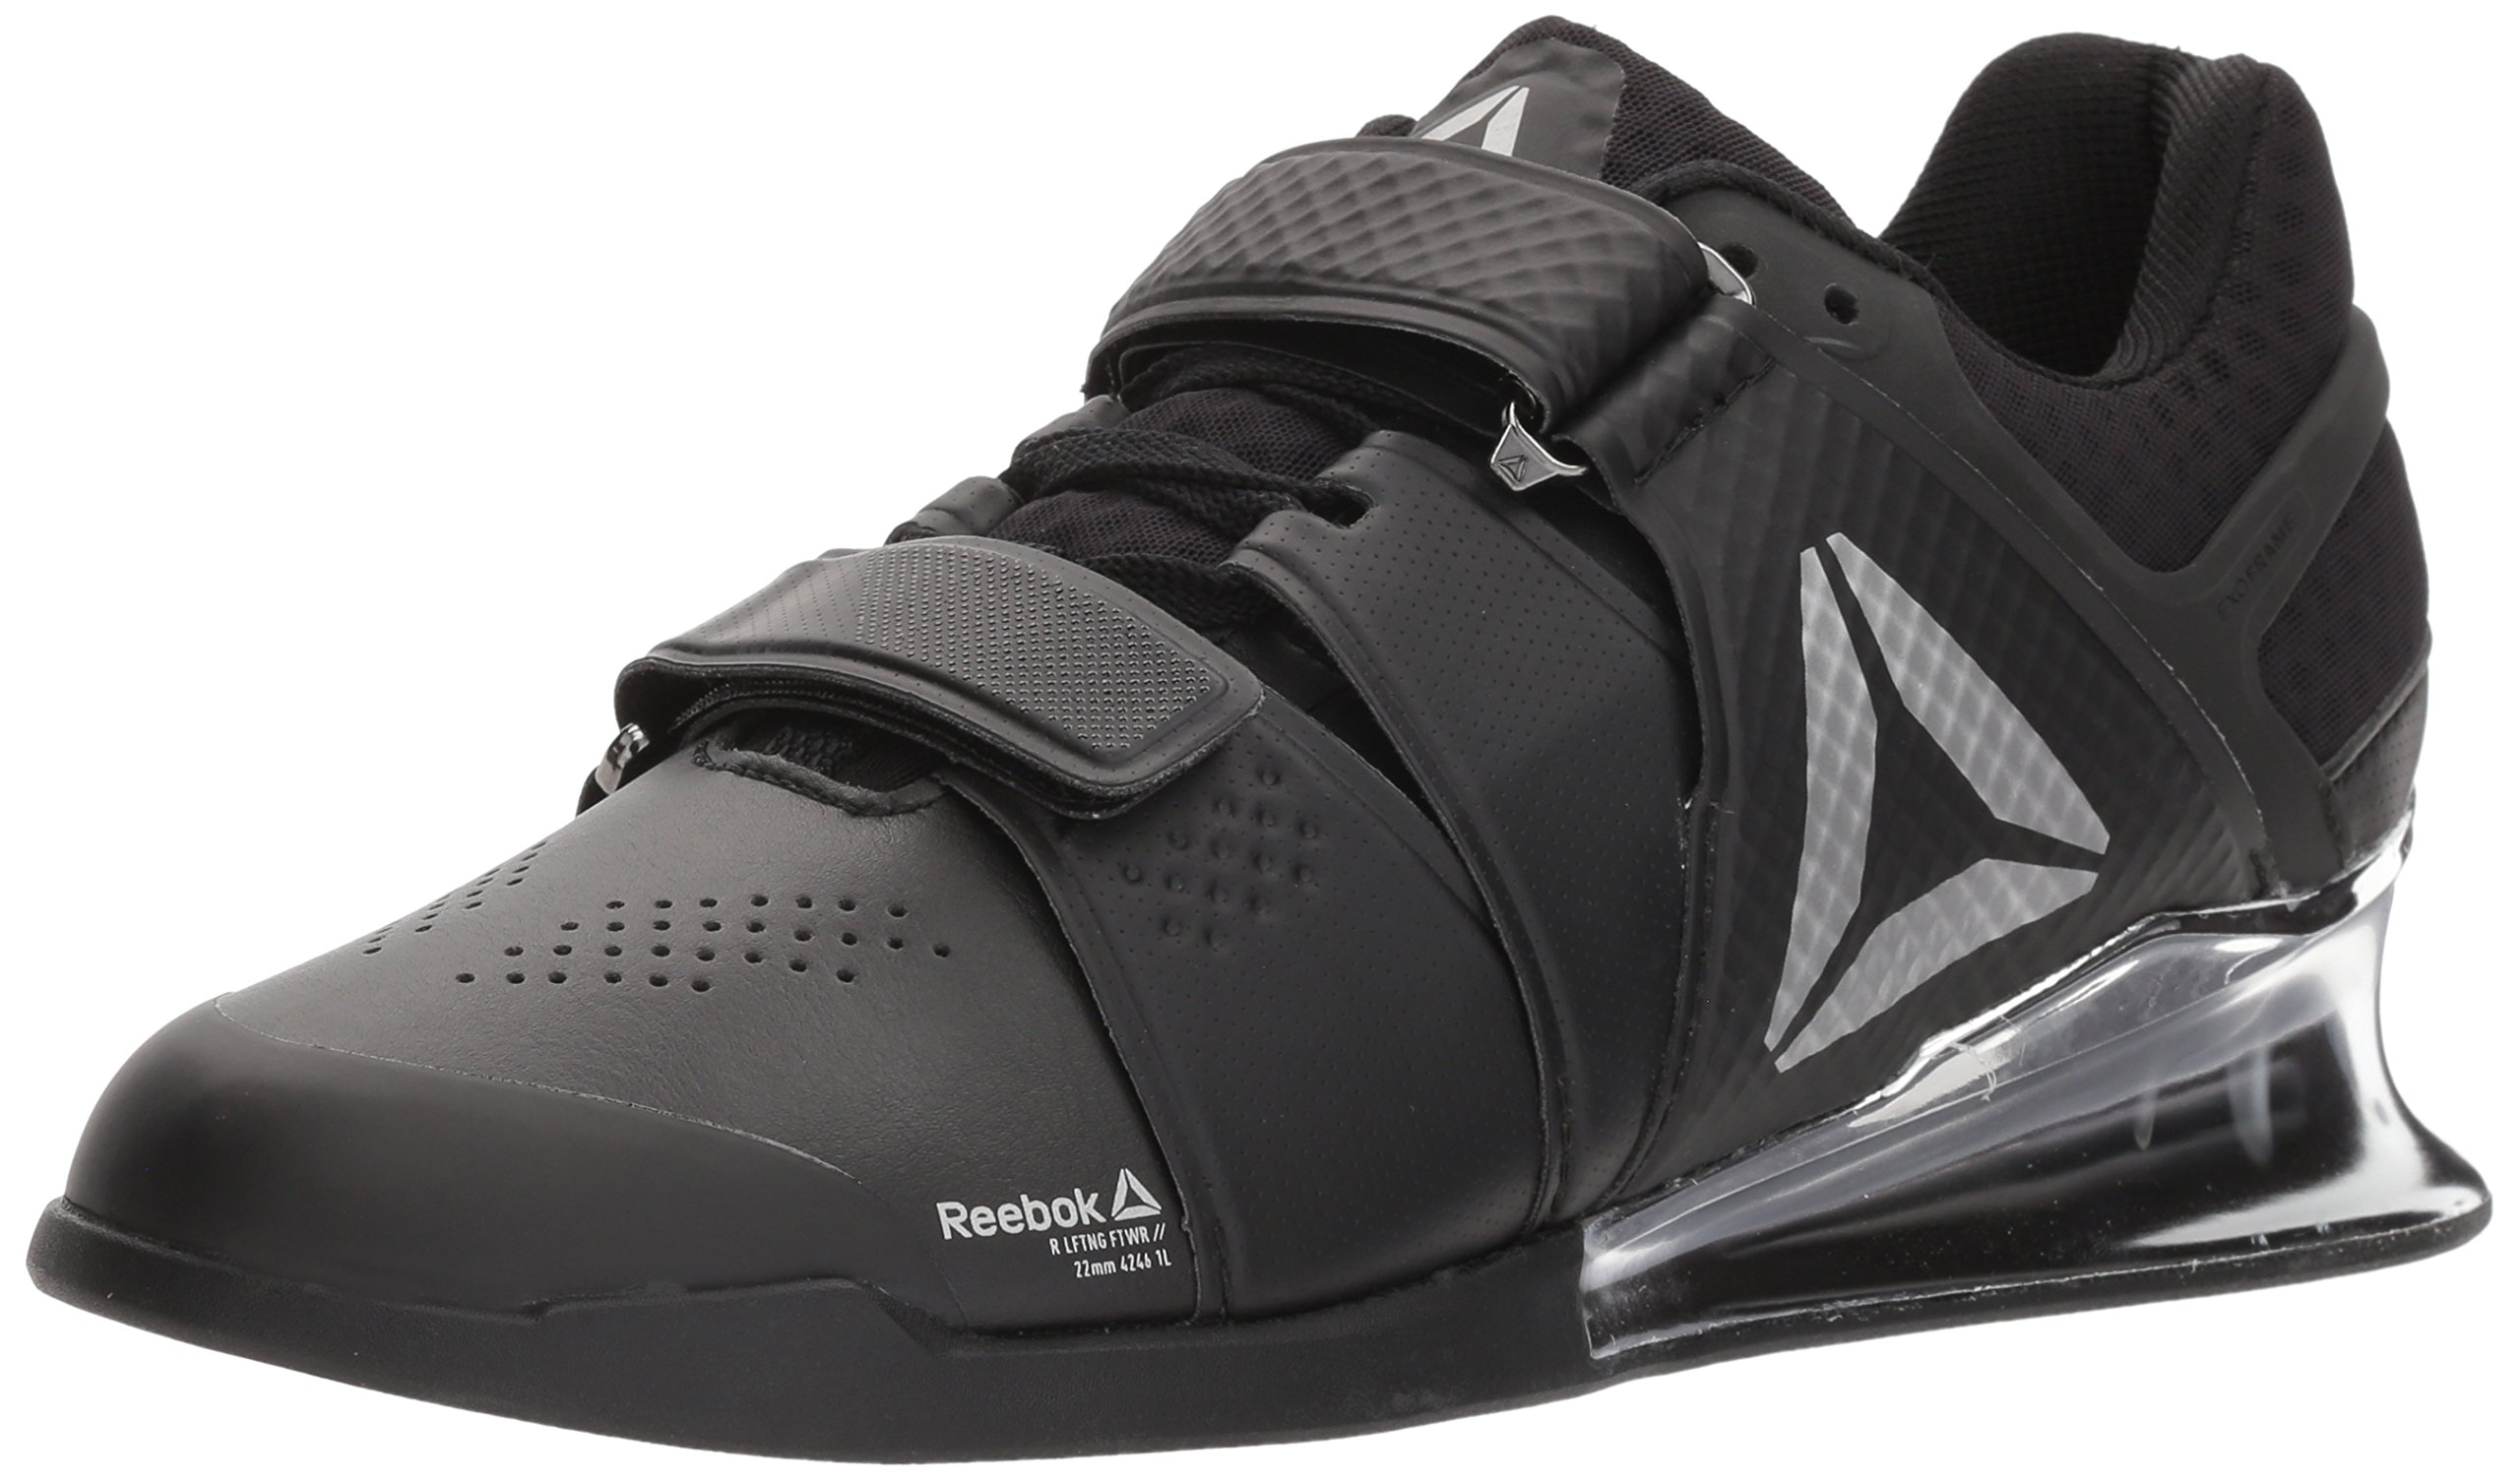 Reebok Women's Legacy Lifter Sneaker, Black/White/Silver, 9.5 M US